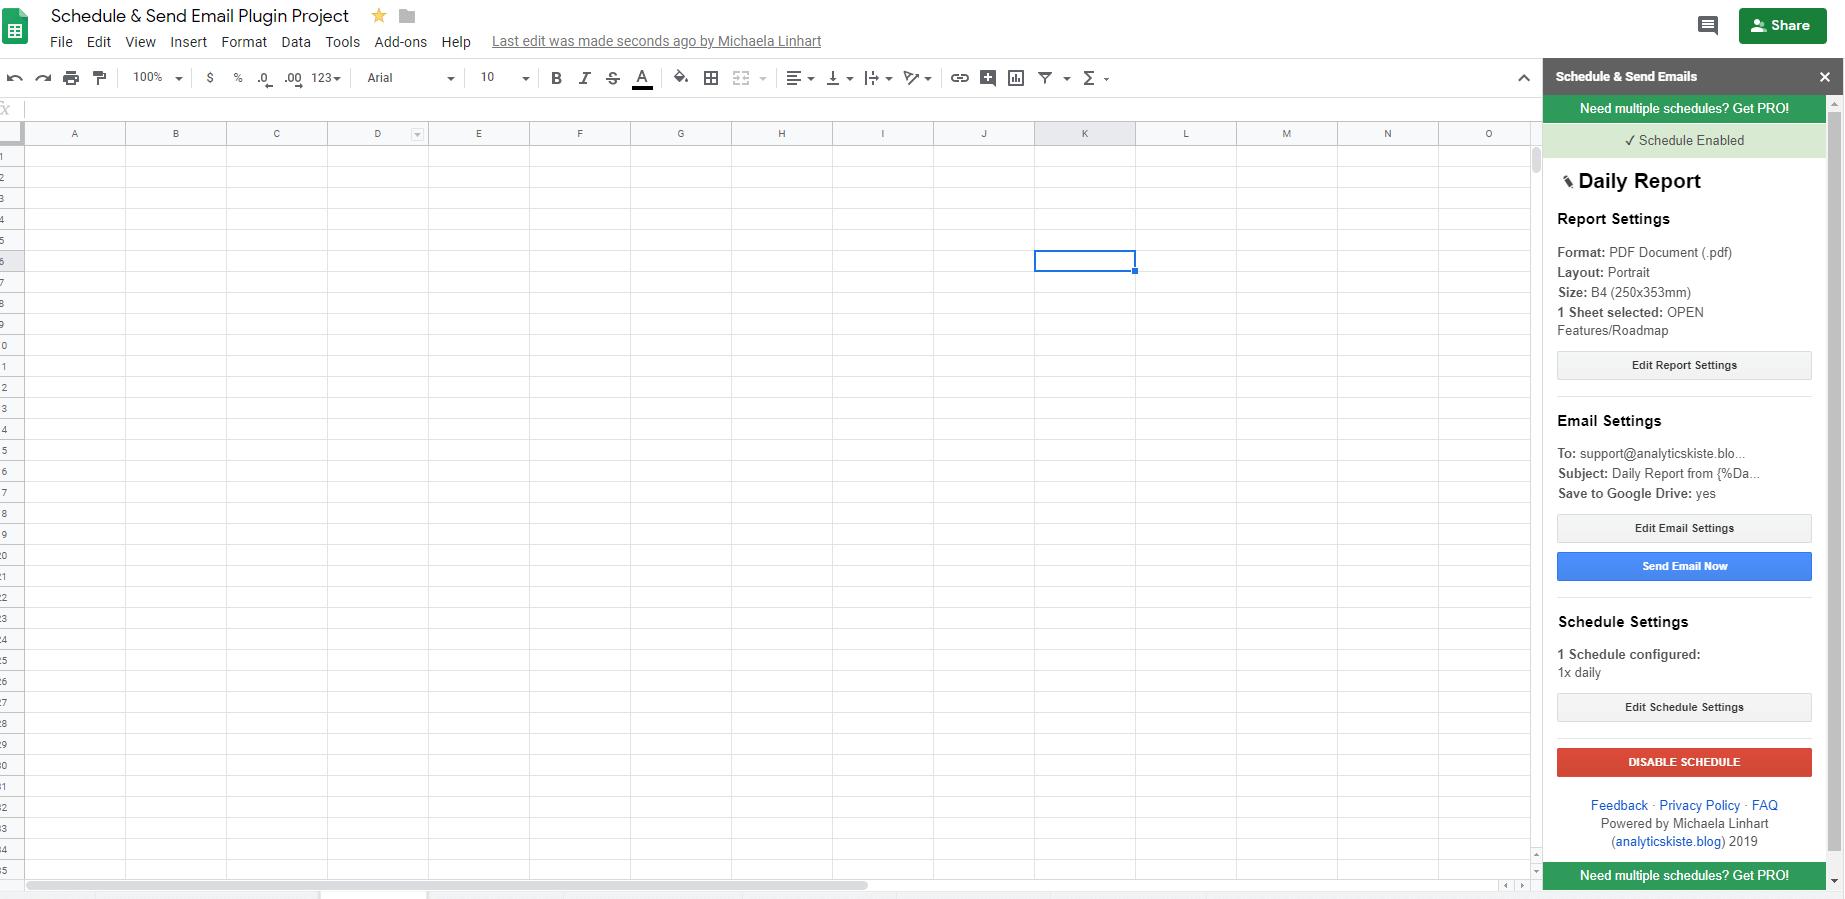 Screenshot: Schedule & Send Email Addon